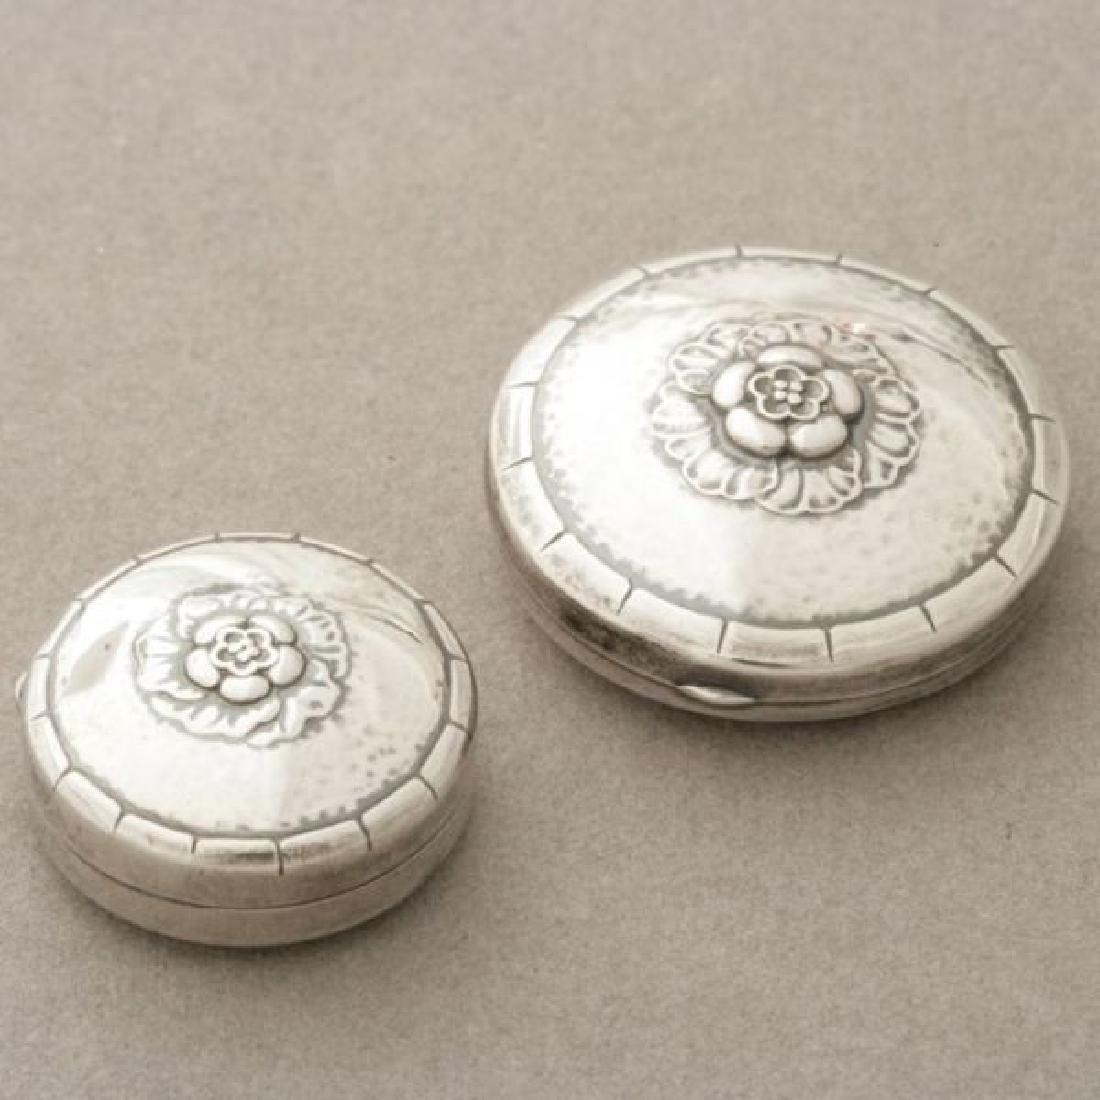 Georg Jensen Sterling Silver Pill Box Compact Set 1930s